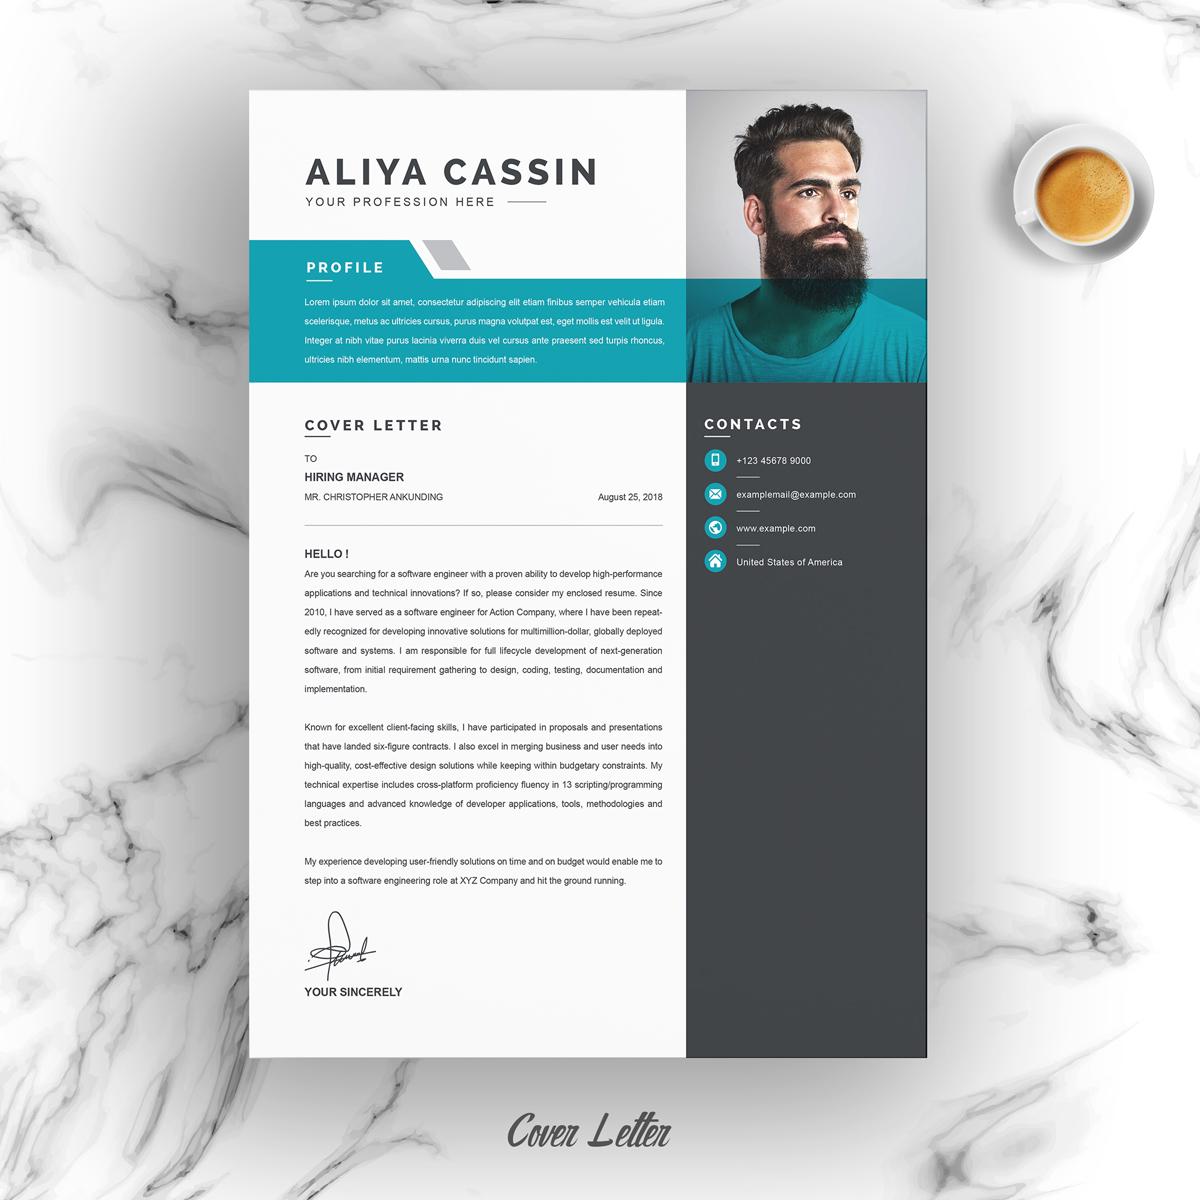 https://s3u.tmimgcdn.com/1860567-1583588749623_04_-Resume-Cover-Letter-Page-Free-Resume-Design-Template.jpg